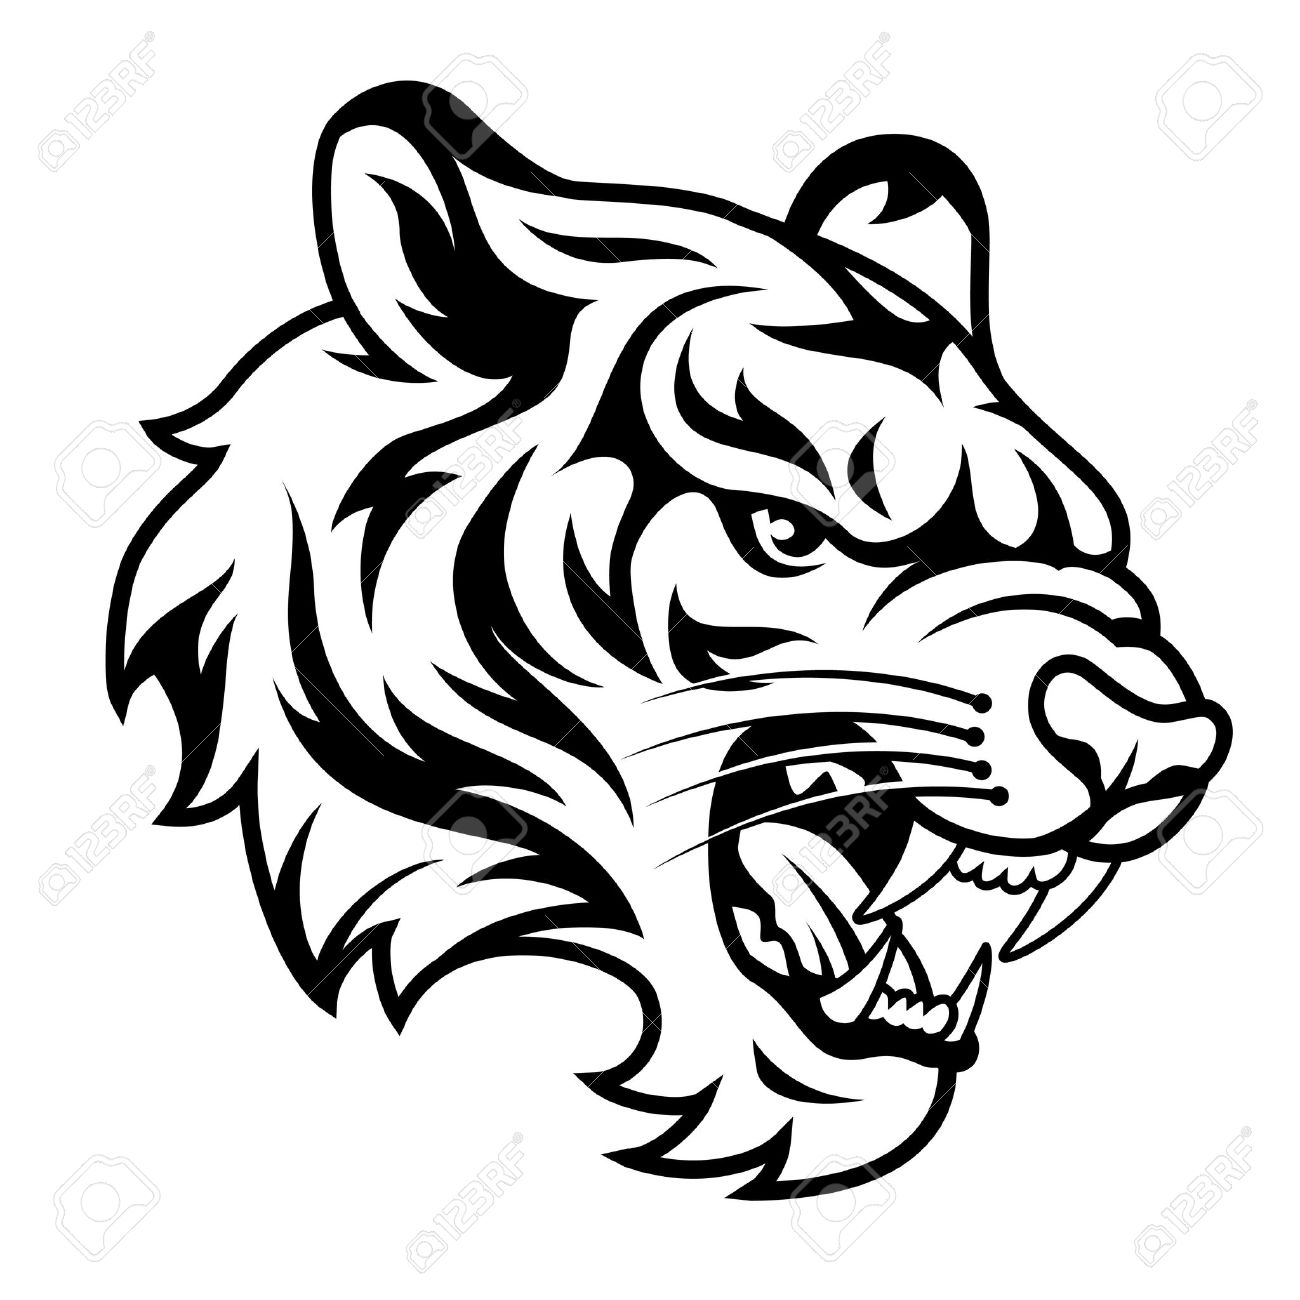 Black tiger clipart clip transparent Tiger Clipart Black And White | Free download best Tiger Clipart ... clip transparent